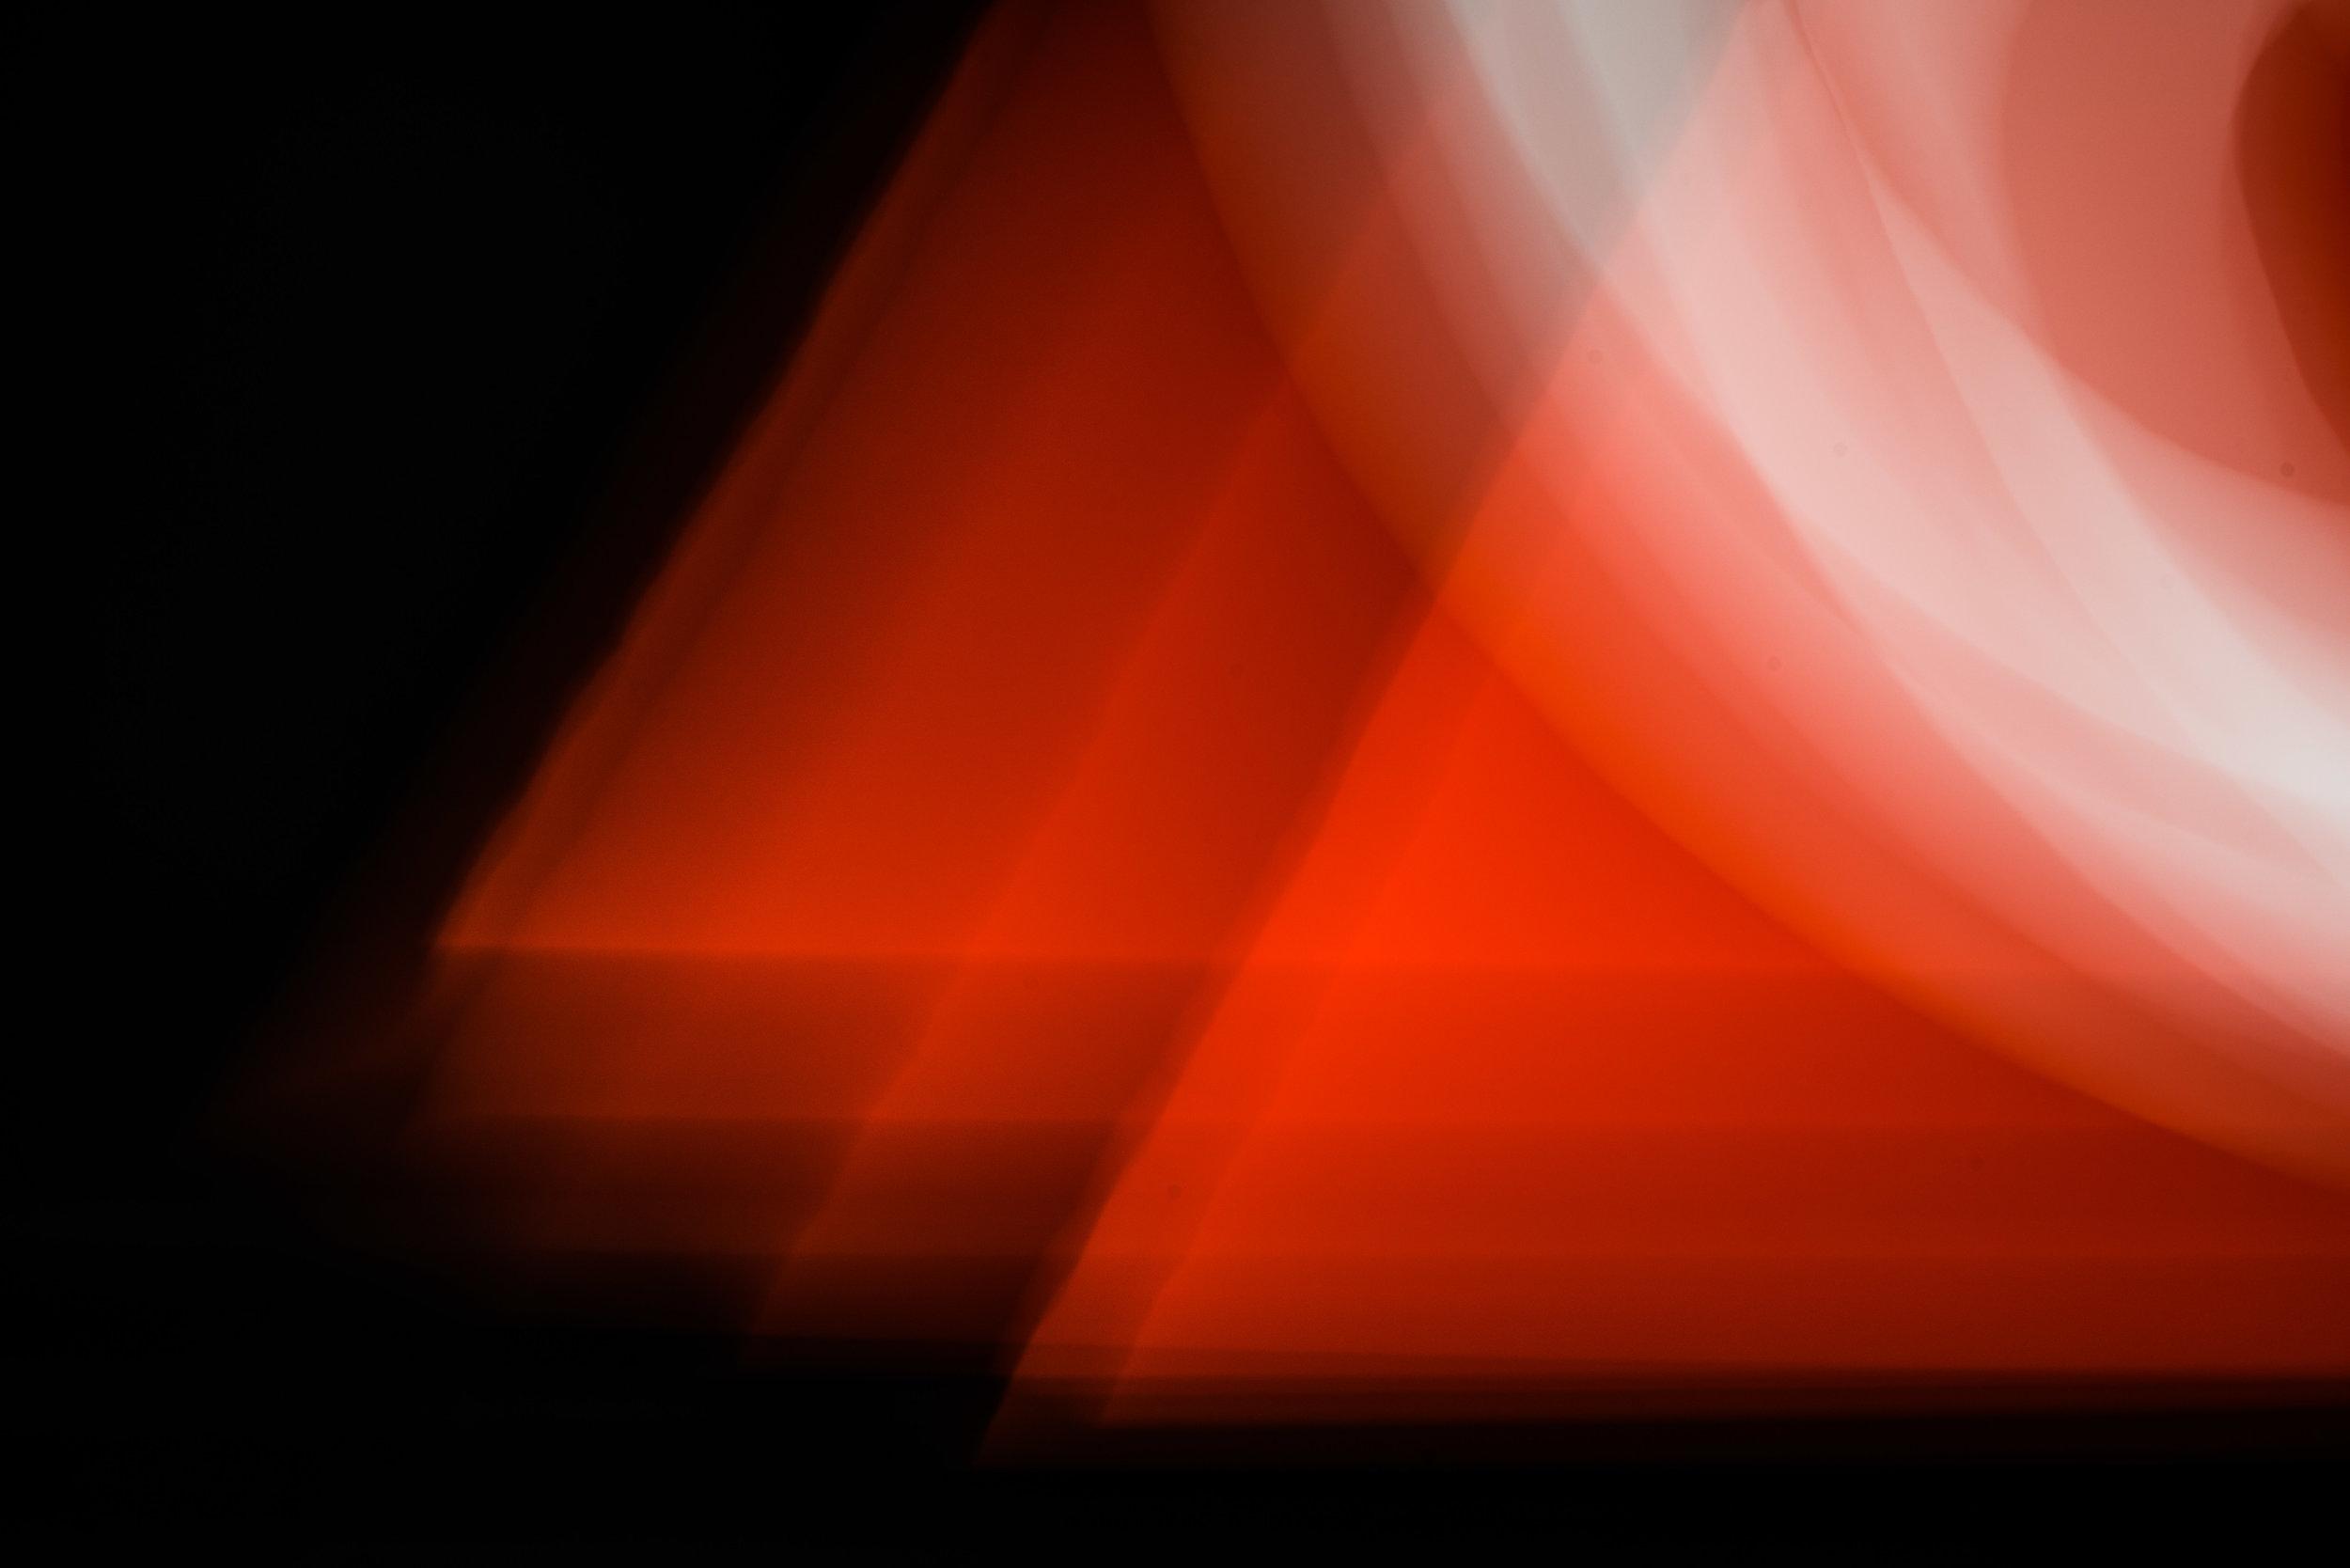 Triple_Point_by_Gregg_Albracht.jpg